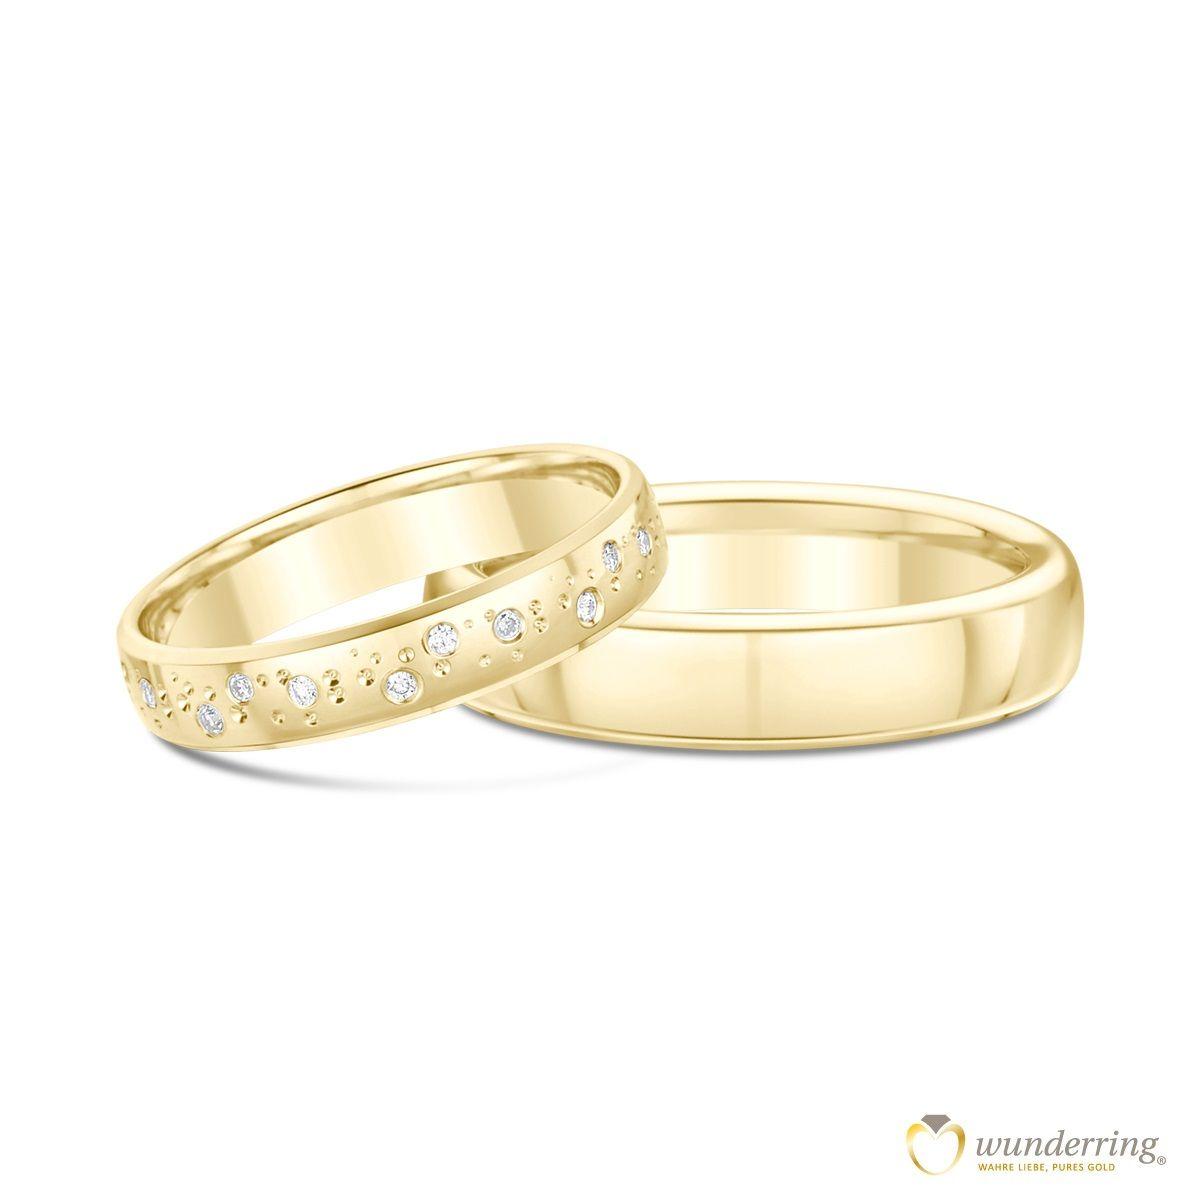 Eheringe gold mit 3 diamanten  Eheringe Gold mit Diamanten Misool. Die Diamanten verlaufen ...